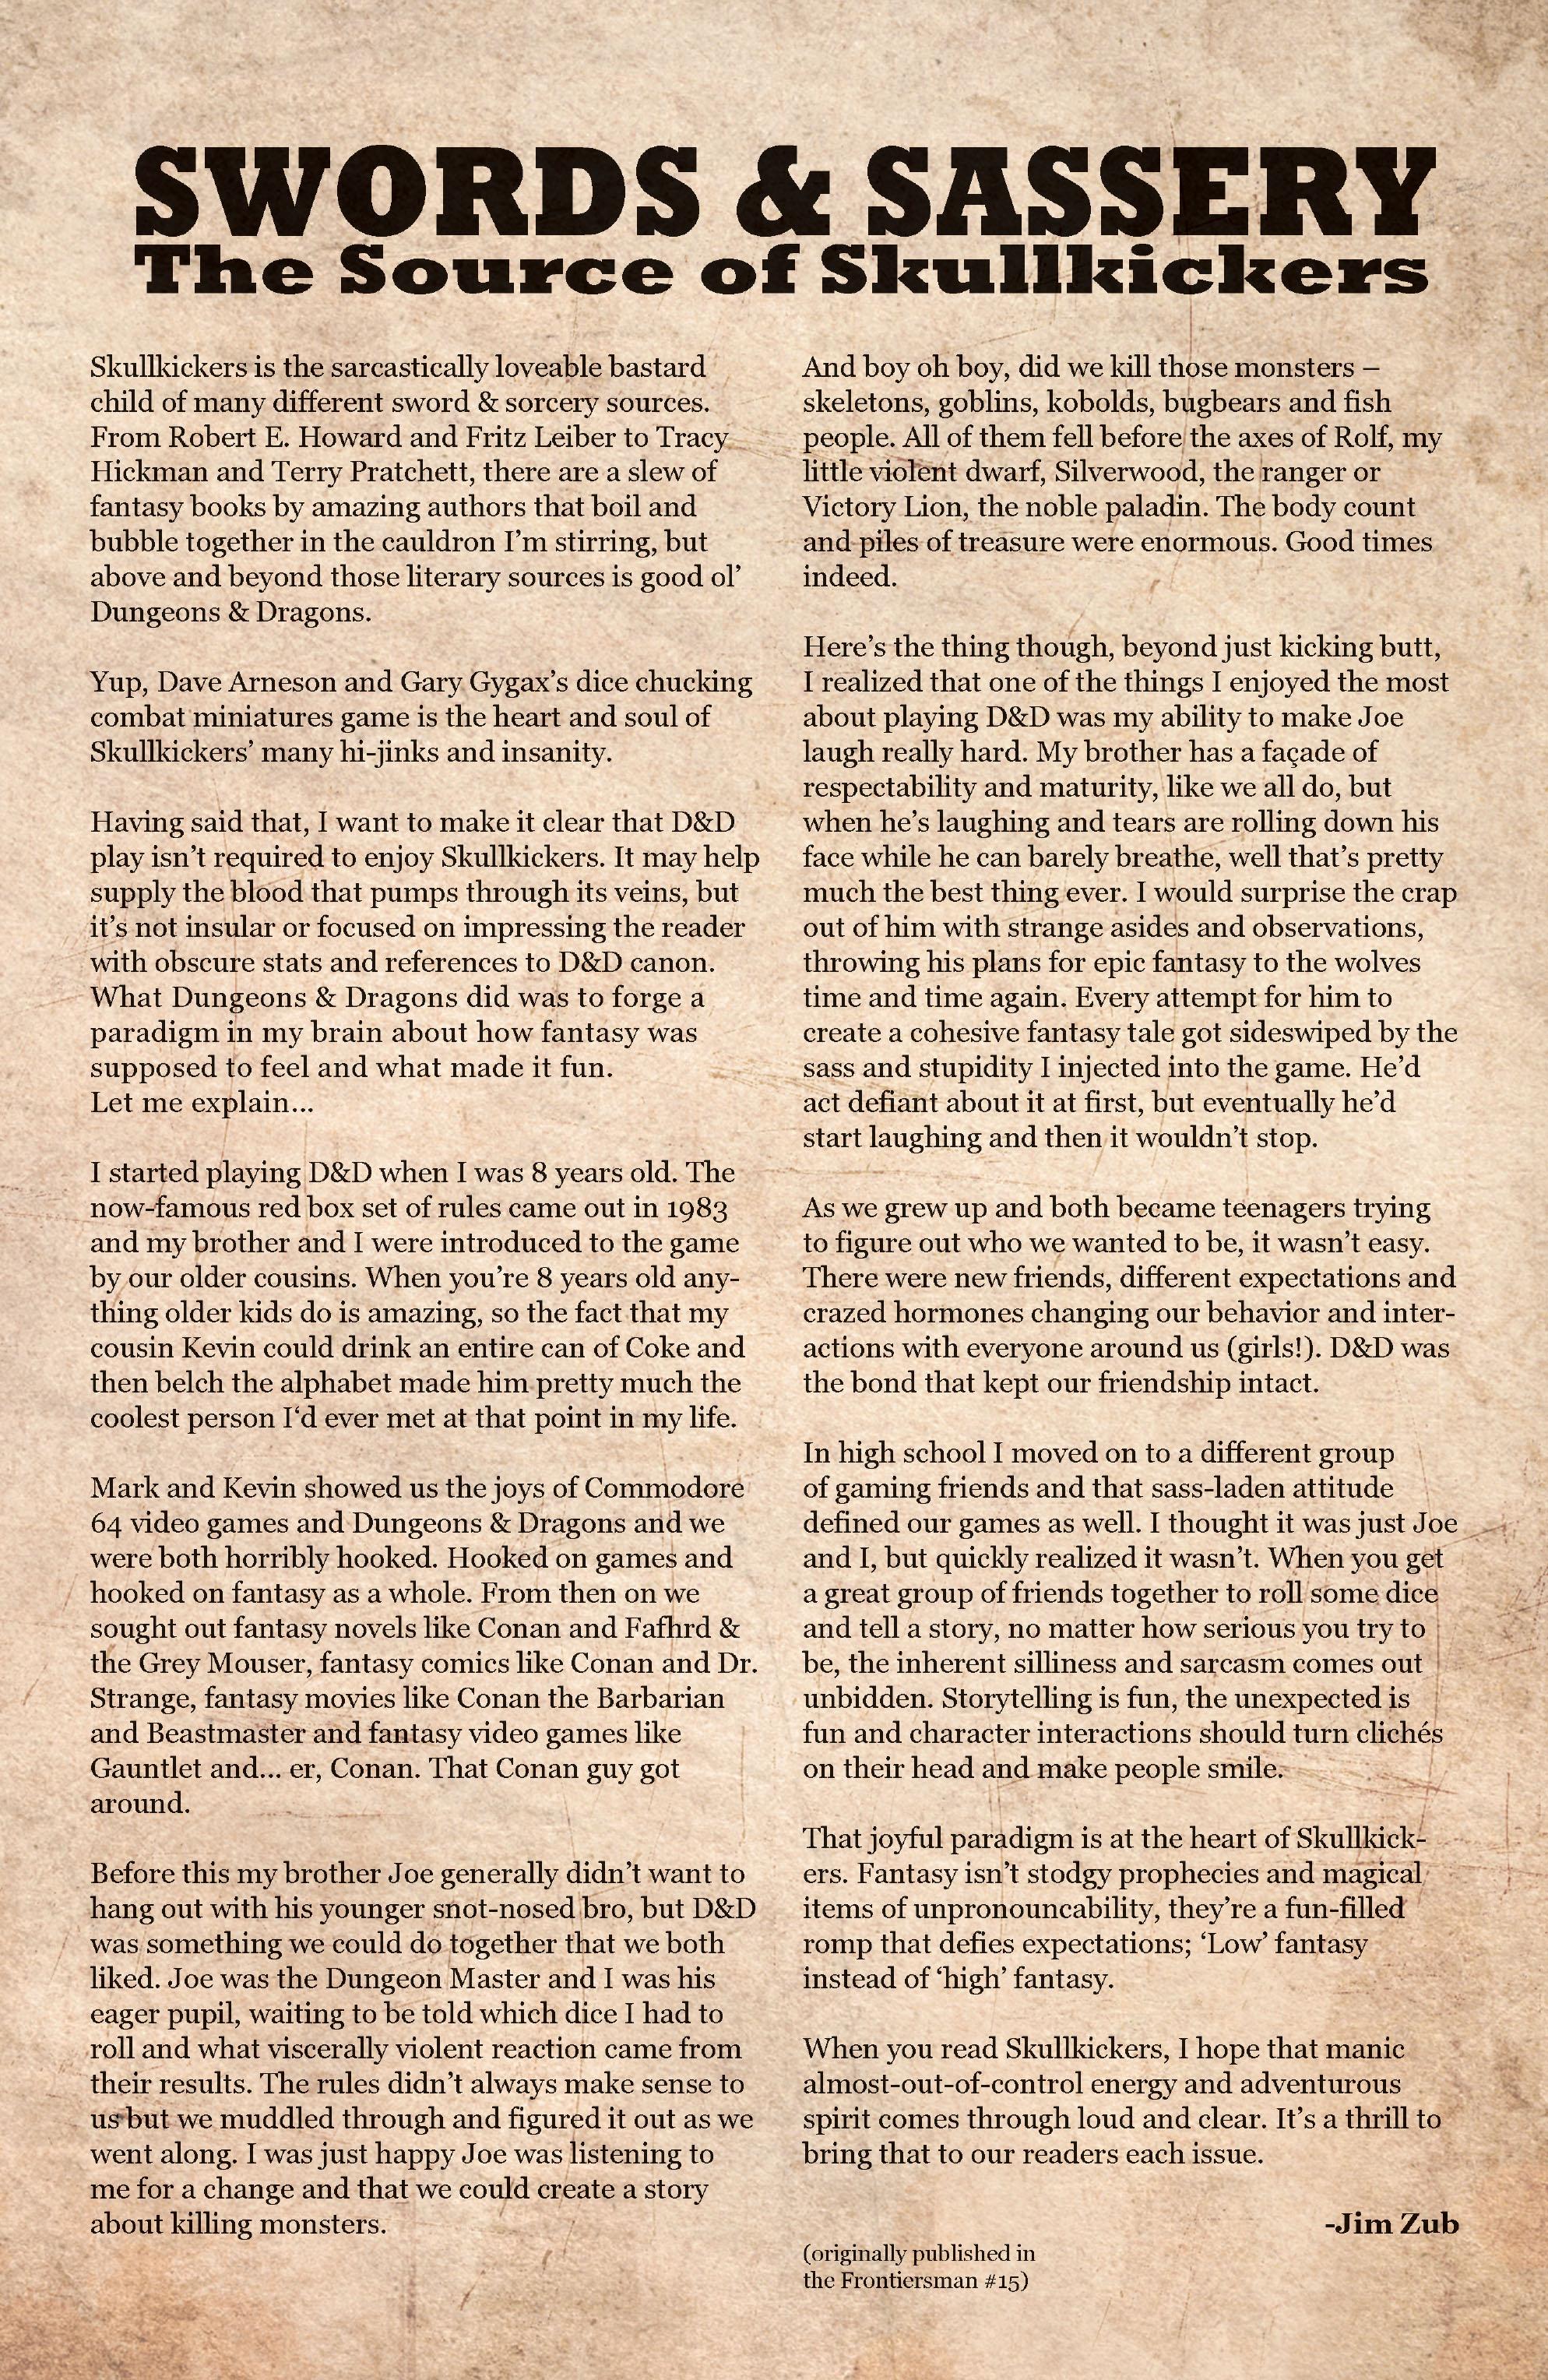 Read online Skullkickers comic -  Issue #9 - 25